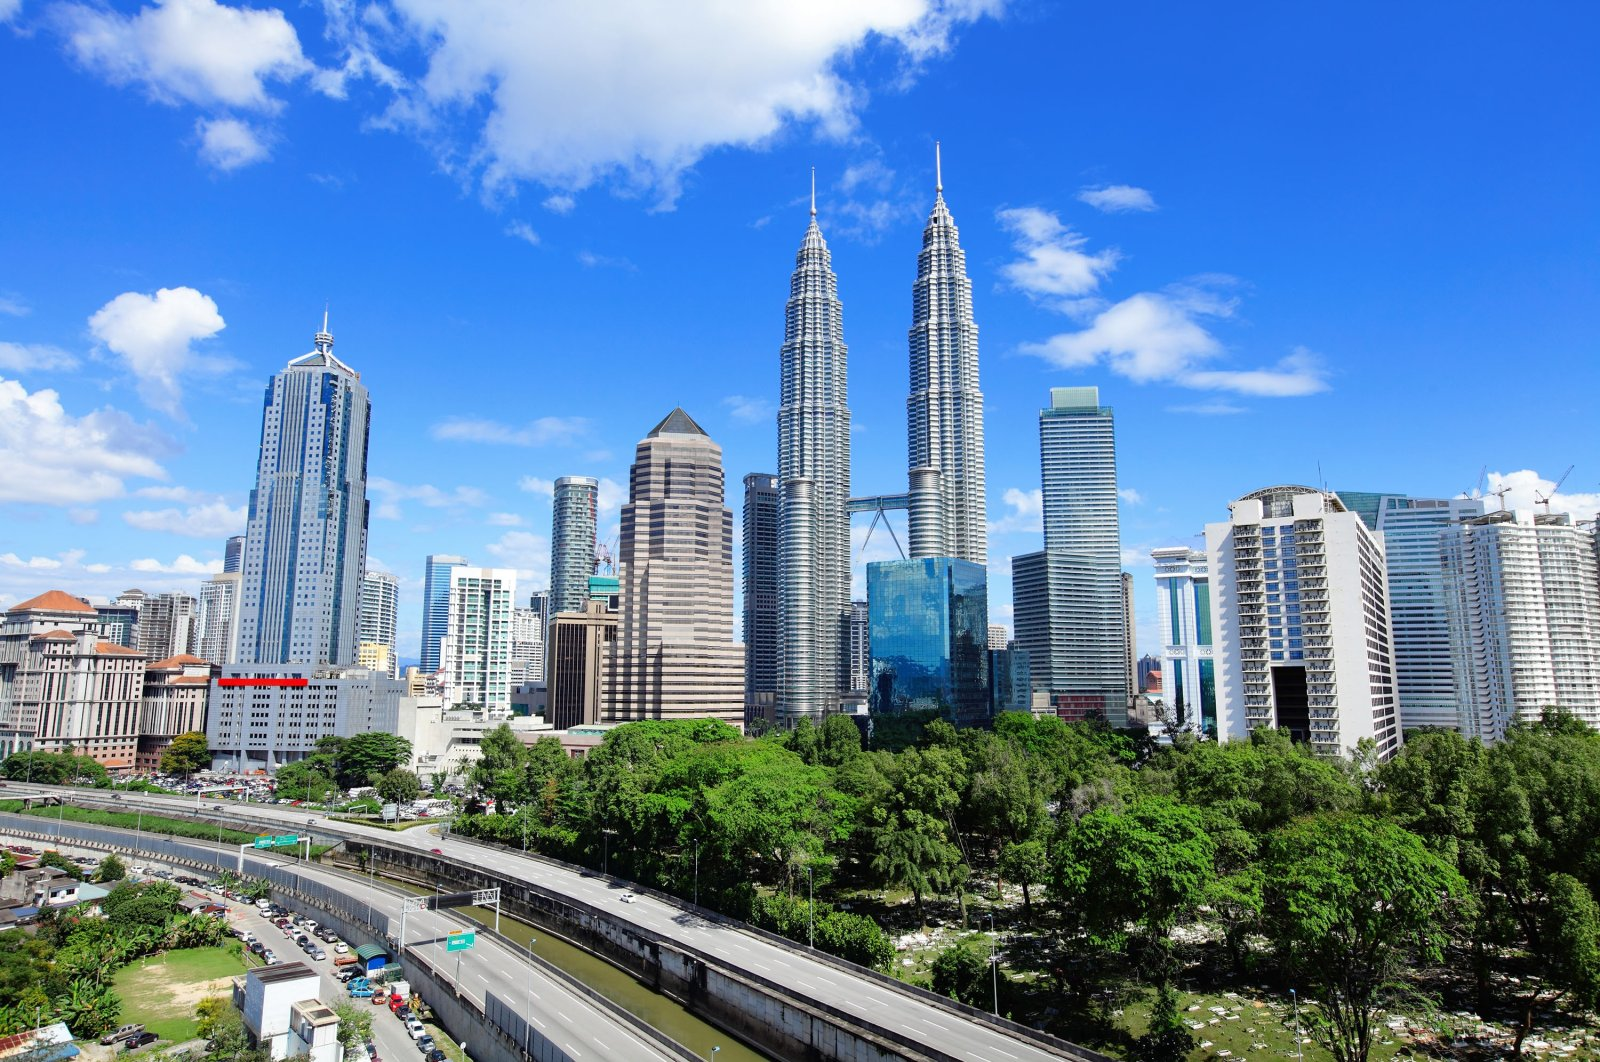 Kuala Lumpur skyline, Malaysia. (Shutterstock Photo)